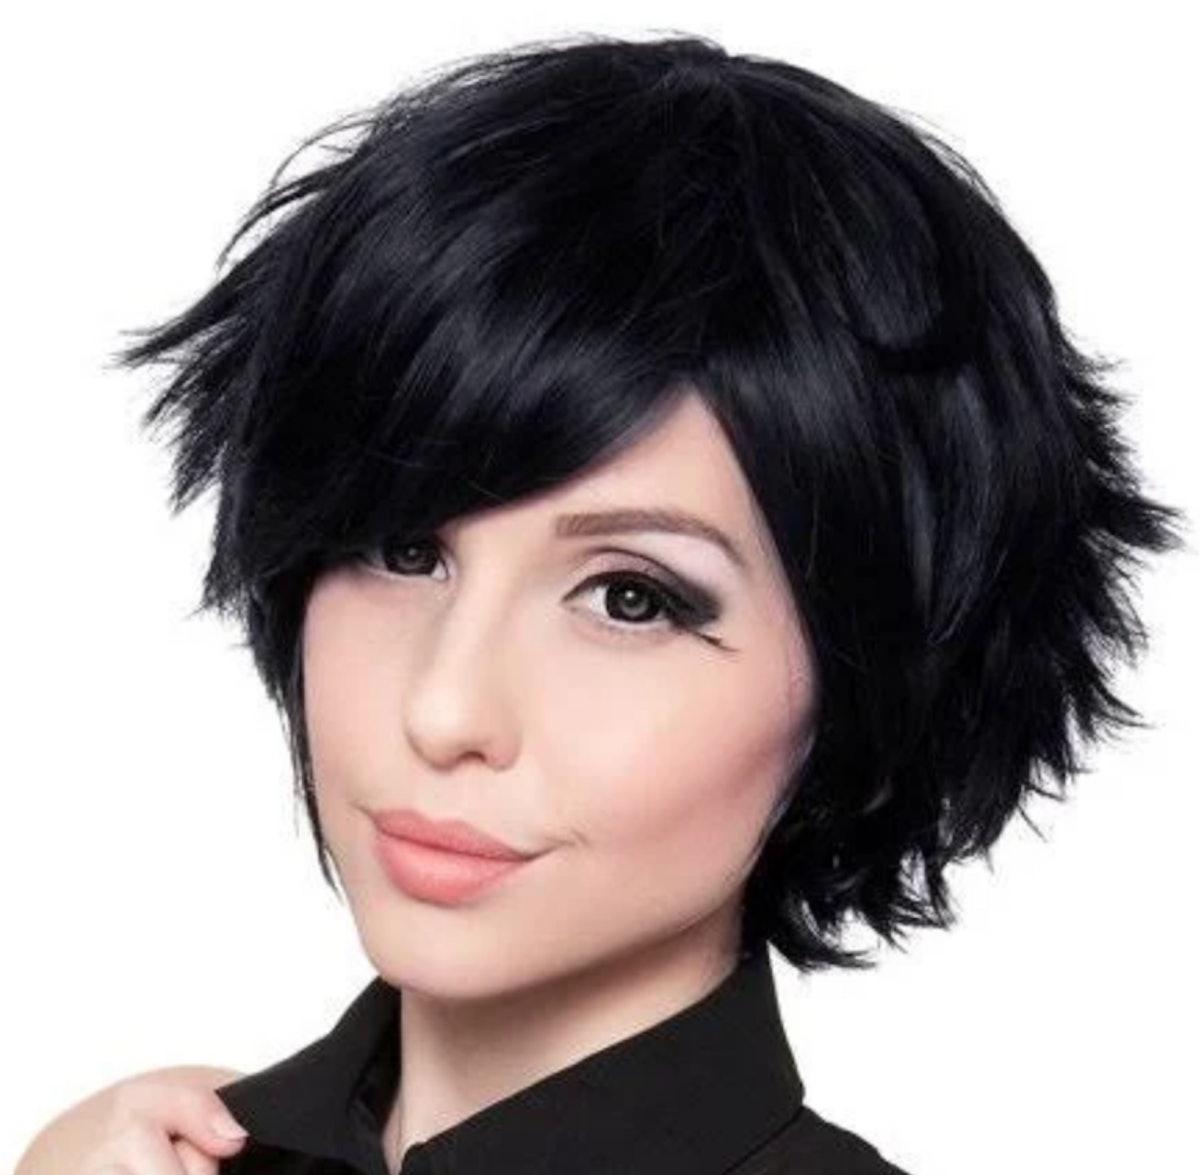 Moira Rose wears a short black wig to play Dr. Clara Mandrake on 'Schitt's Creek.'